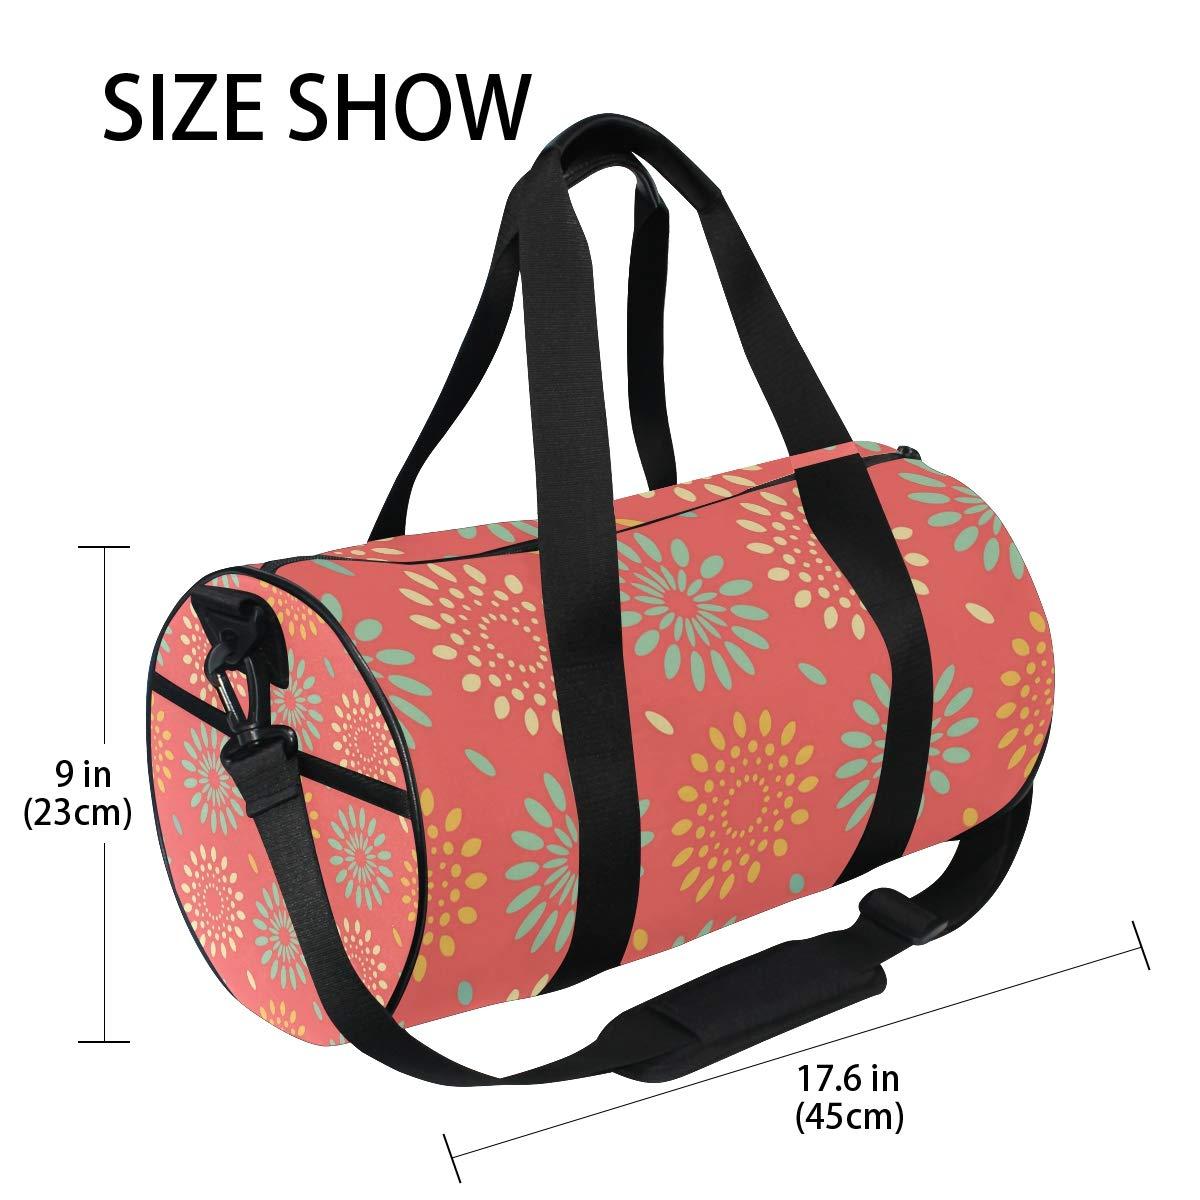 Red Snowflake RaindropsWaterproof Non-Slip Wearable Crossbody Bag fitness bag Shoulder Bag